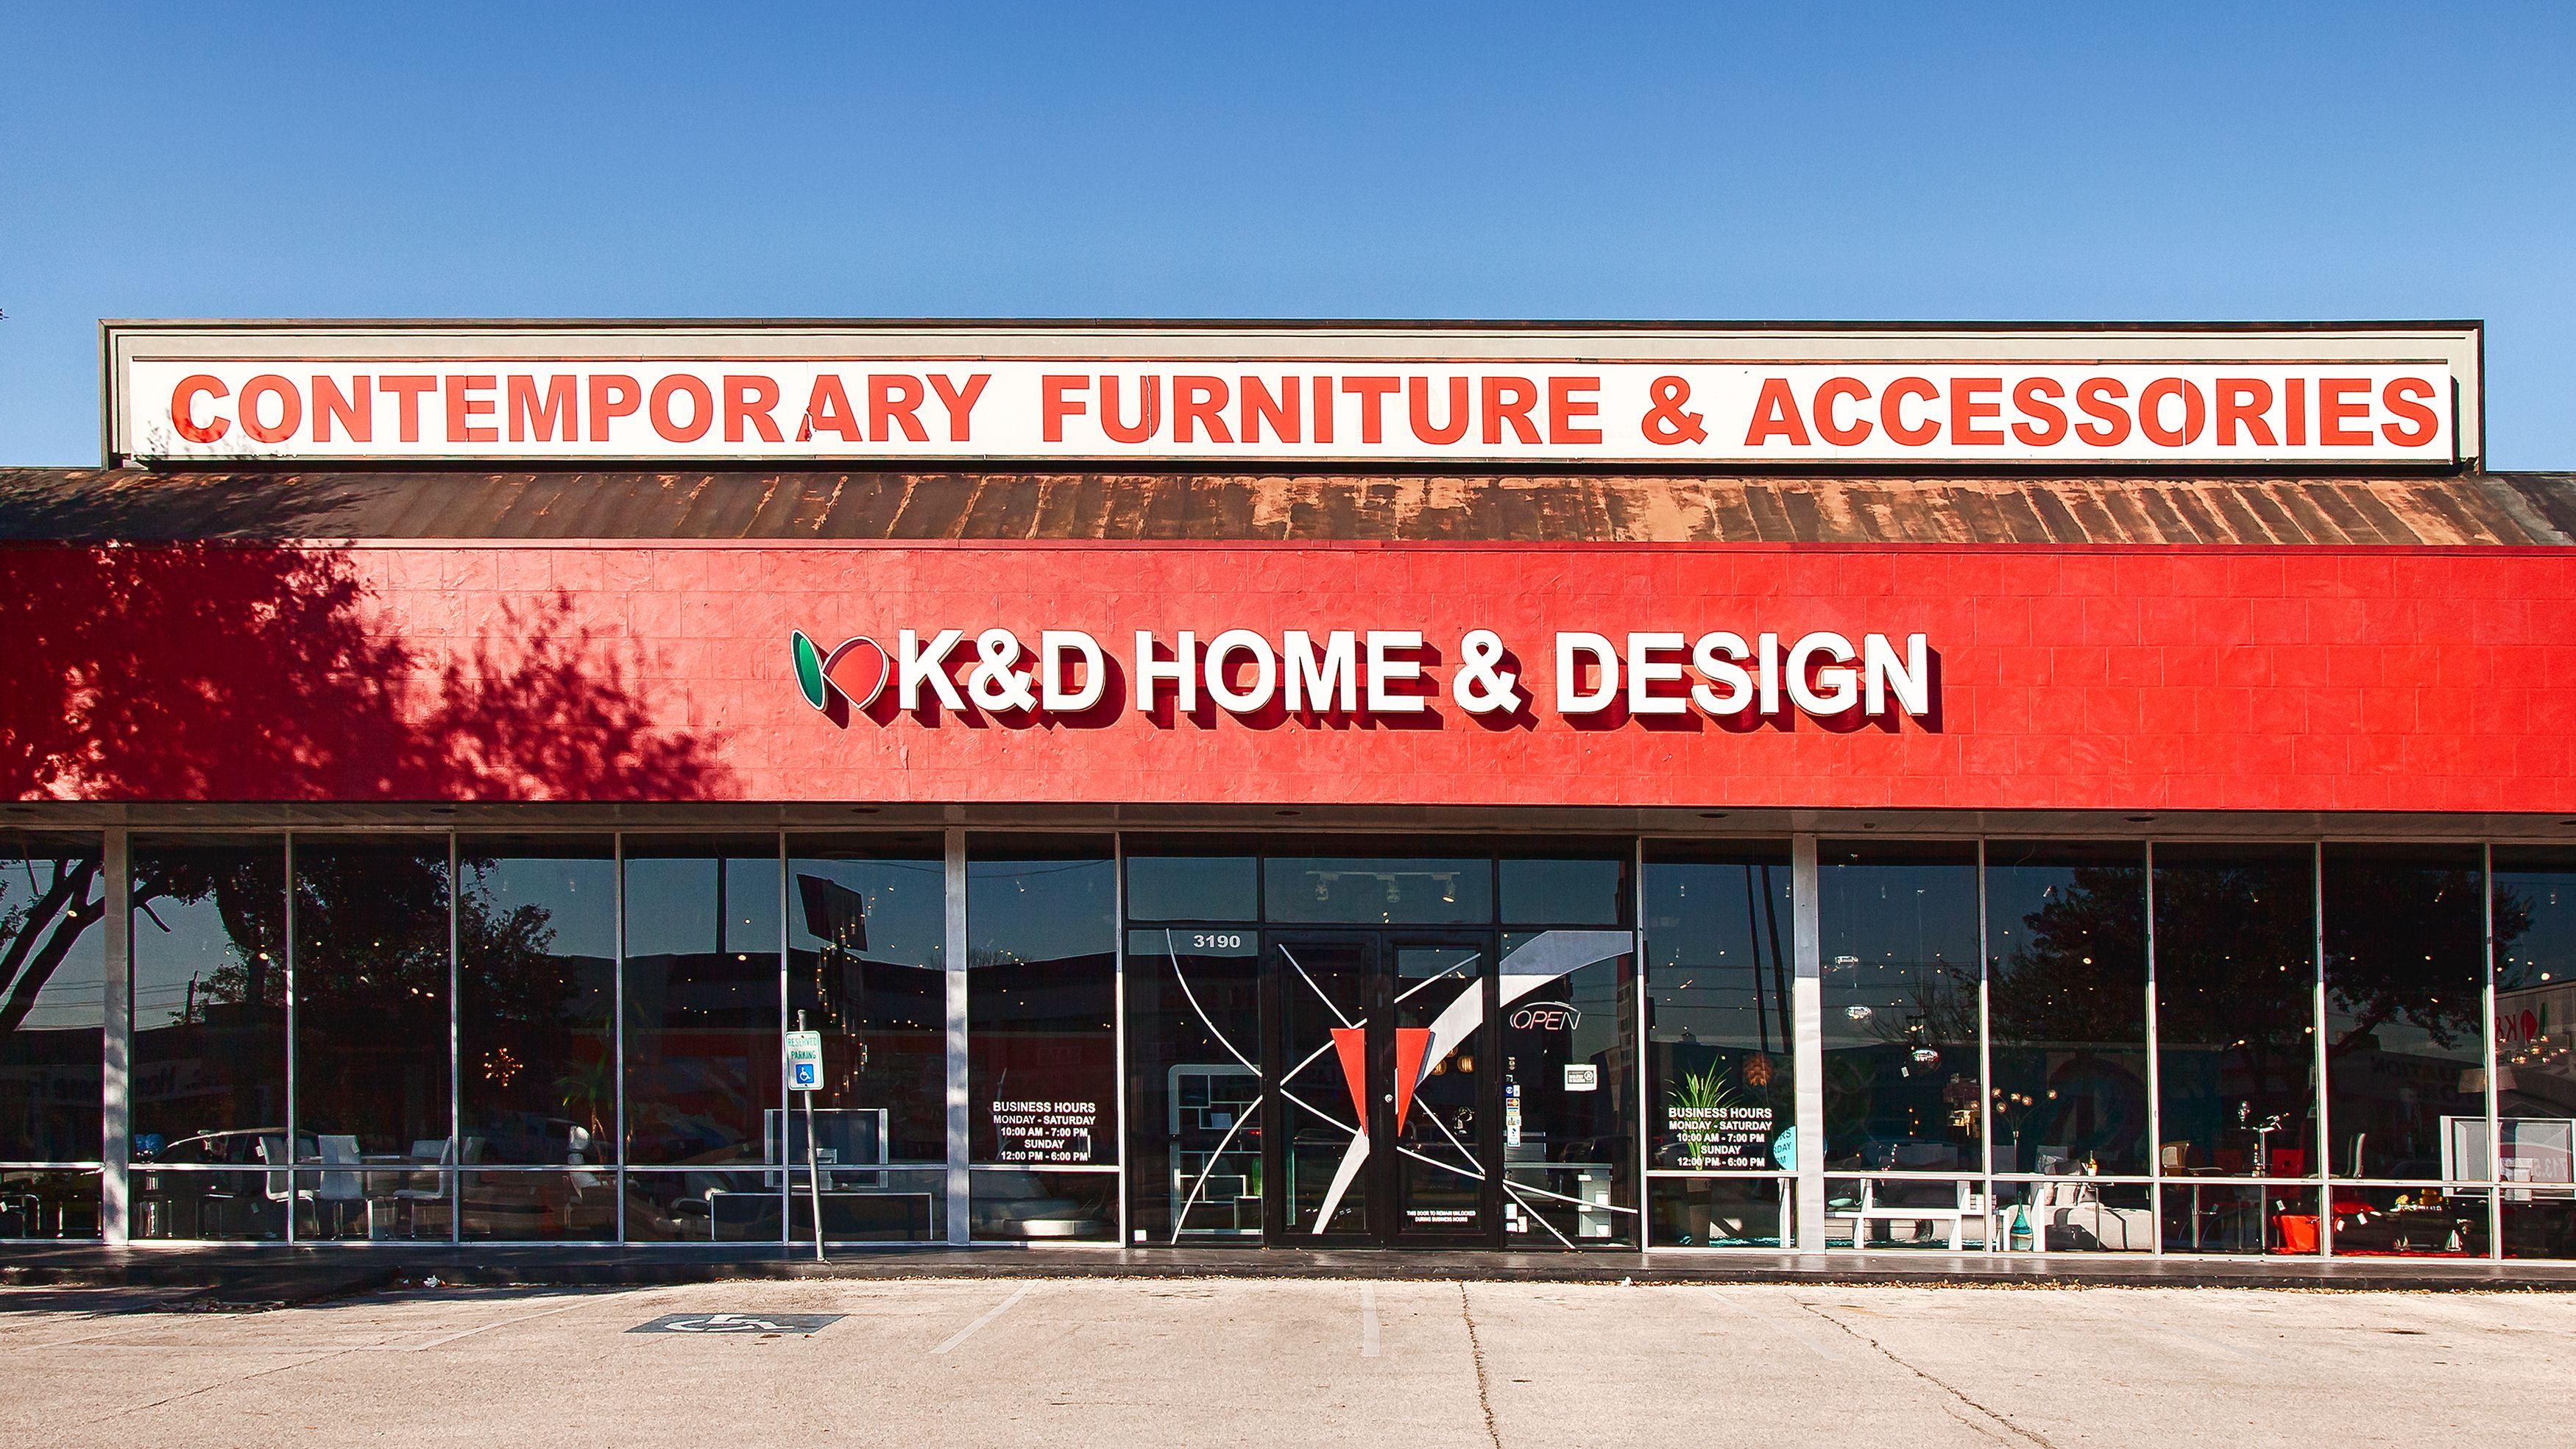 Visit Us 3190 Fondren Rd Houston Tx 77063 713 574 2457 Kineticfurniture Yahoo Com Kndhouston Com Contemporary Furniture Houston Furniture Design